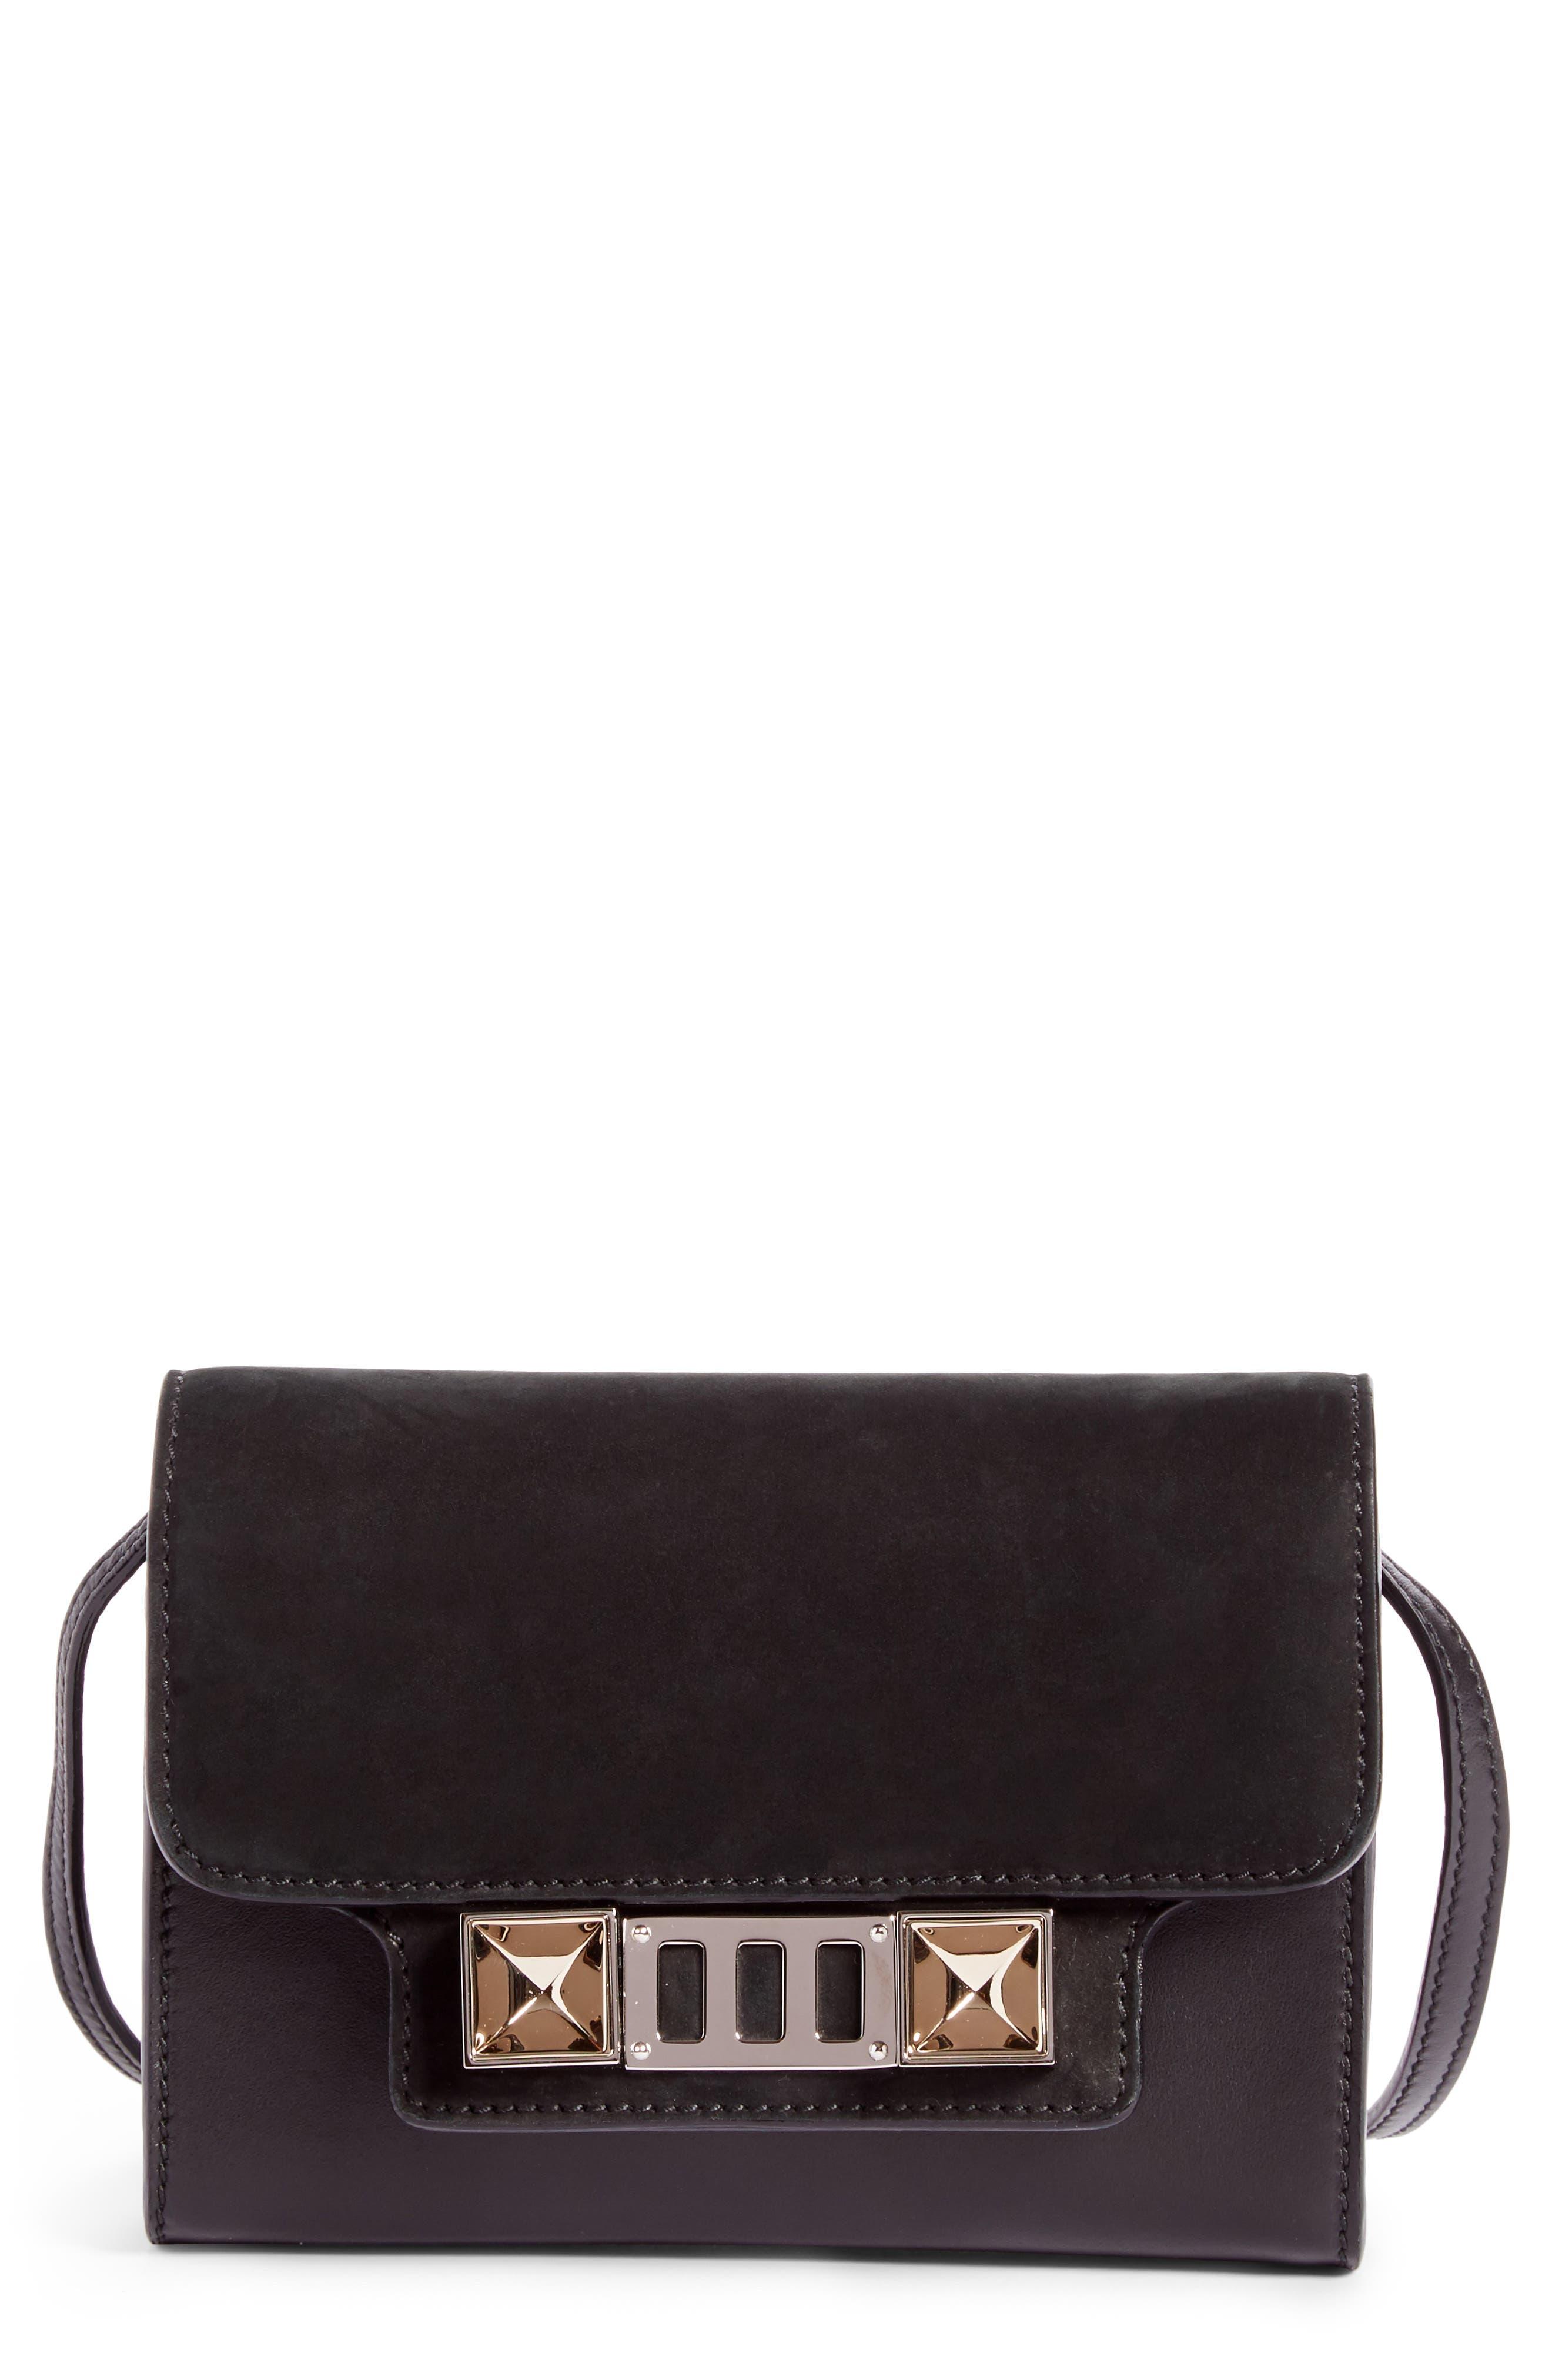 PS11 Calfskin Leather Crossbody Wallet,                             Main thumbnail 1, color,                             001